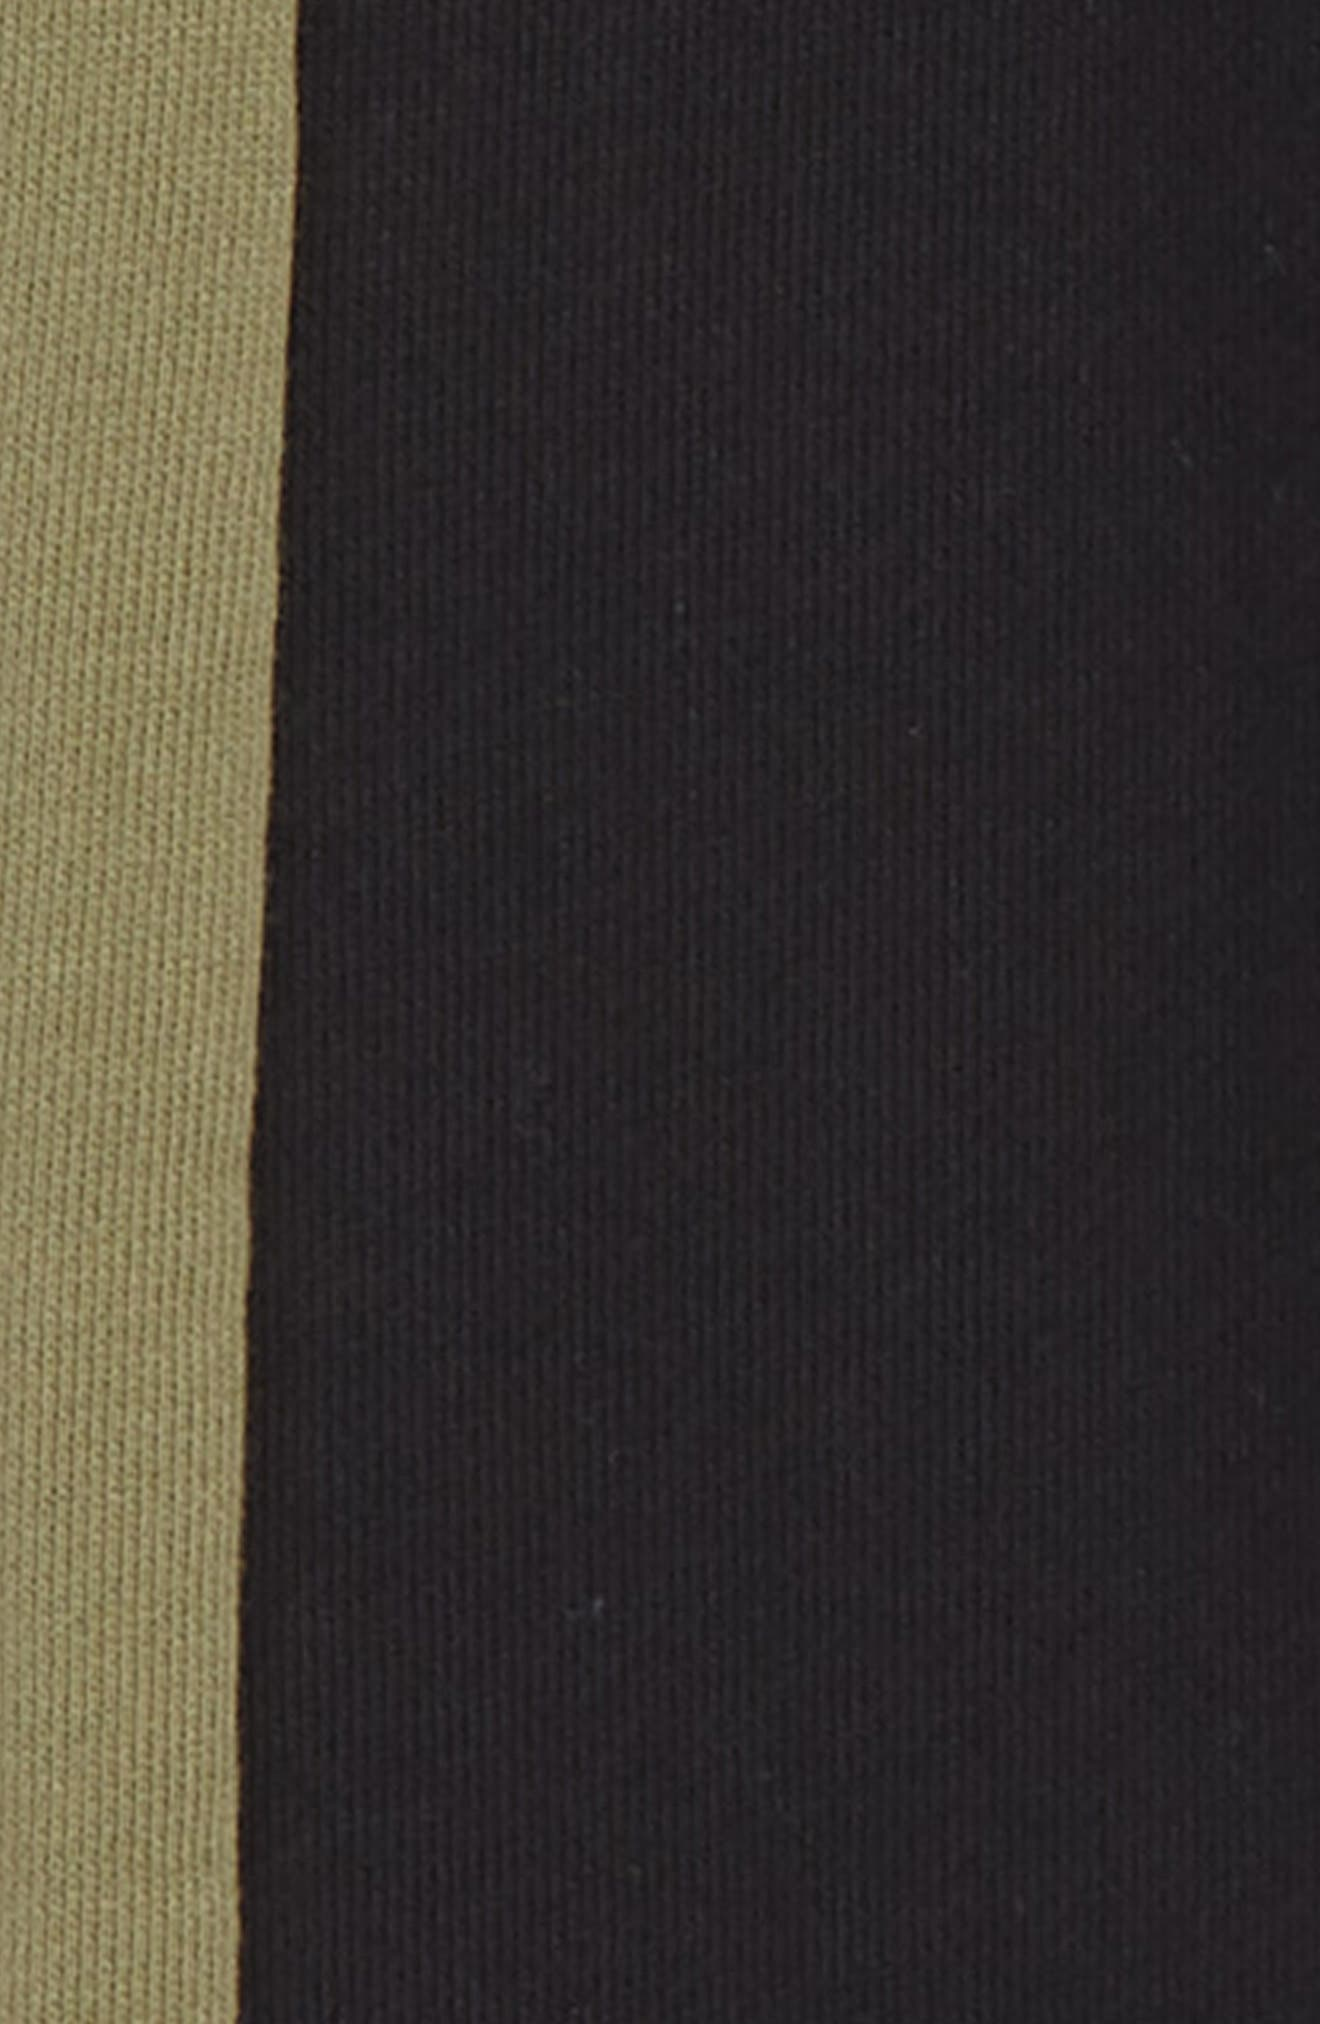 Club Nomad Sweatpants,                             Alternate thumbnail 2, color,                             001